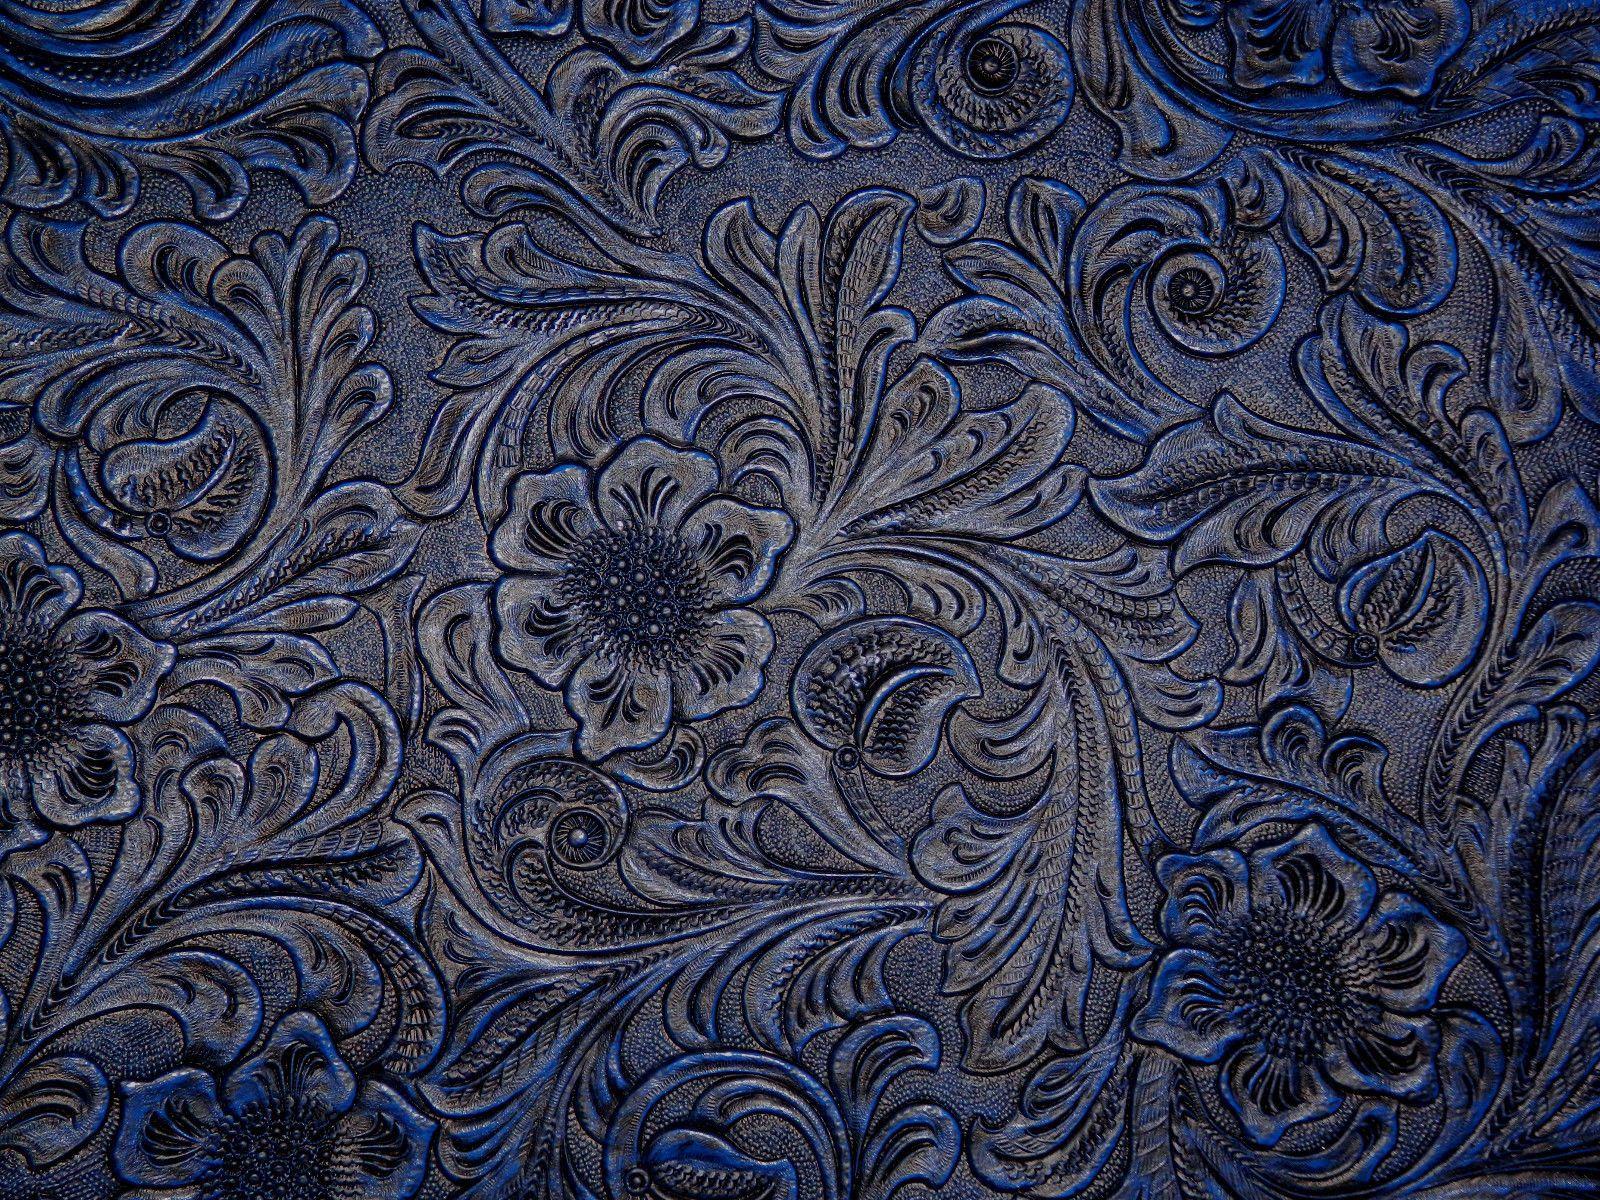 Vinyl Varied Blue Dk Blue Floral Tooled Faux Leather